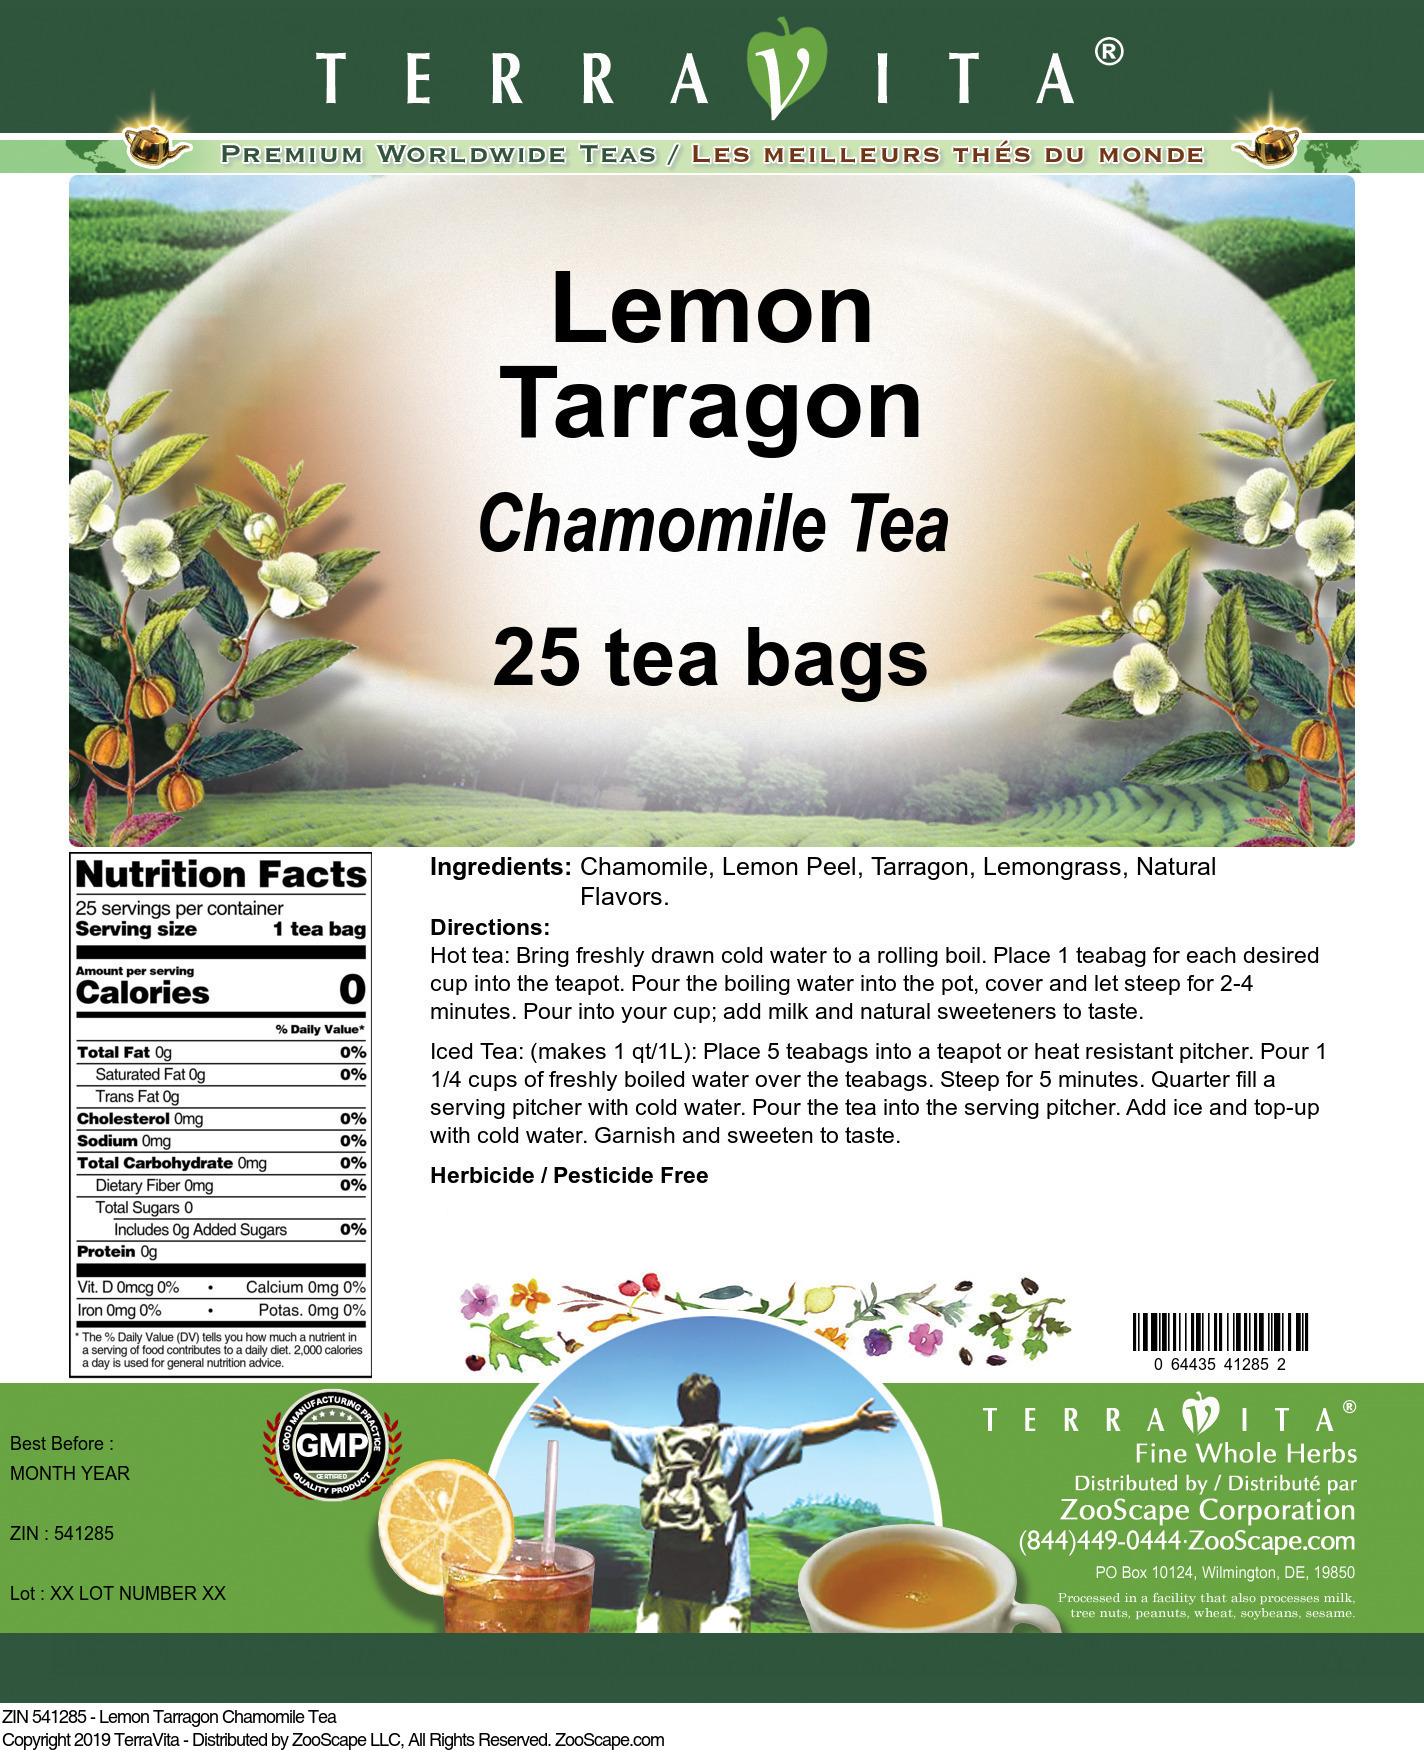 Lemon Tarragon Chamomile Tea